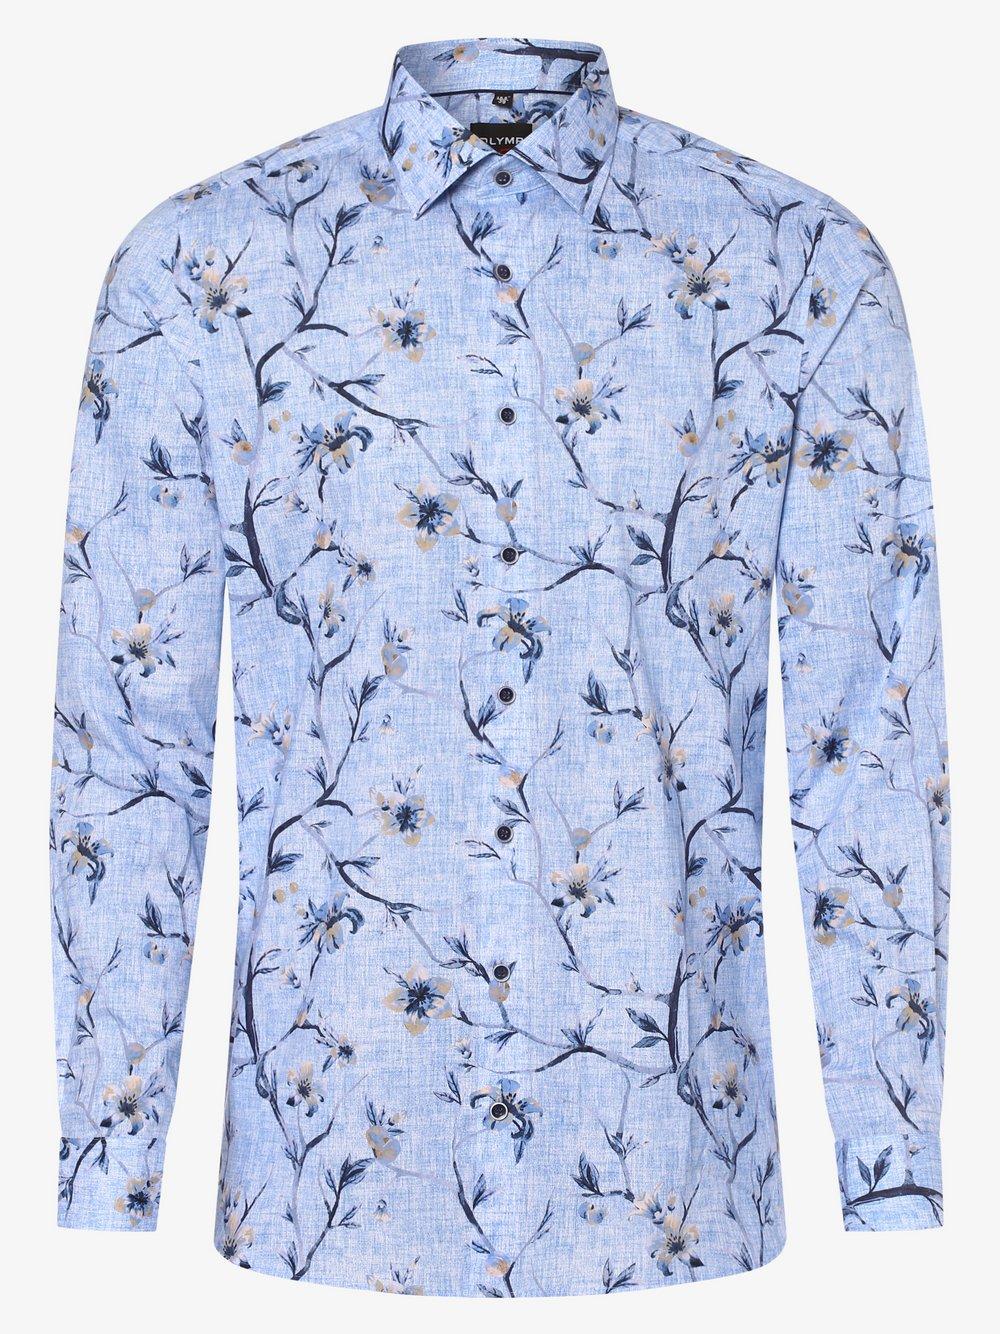 Olymp Level Five – Koszula męska, niebieski Van Graaf 472366-0001-00420